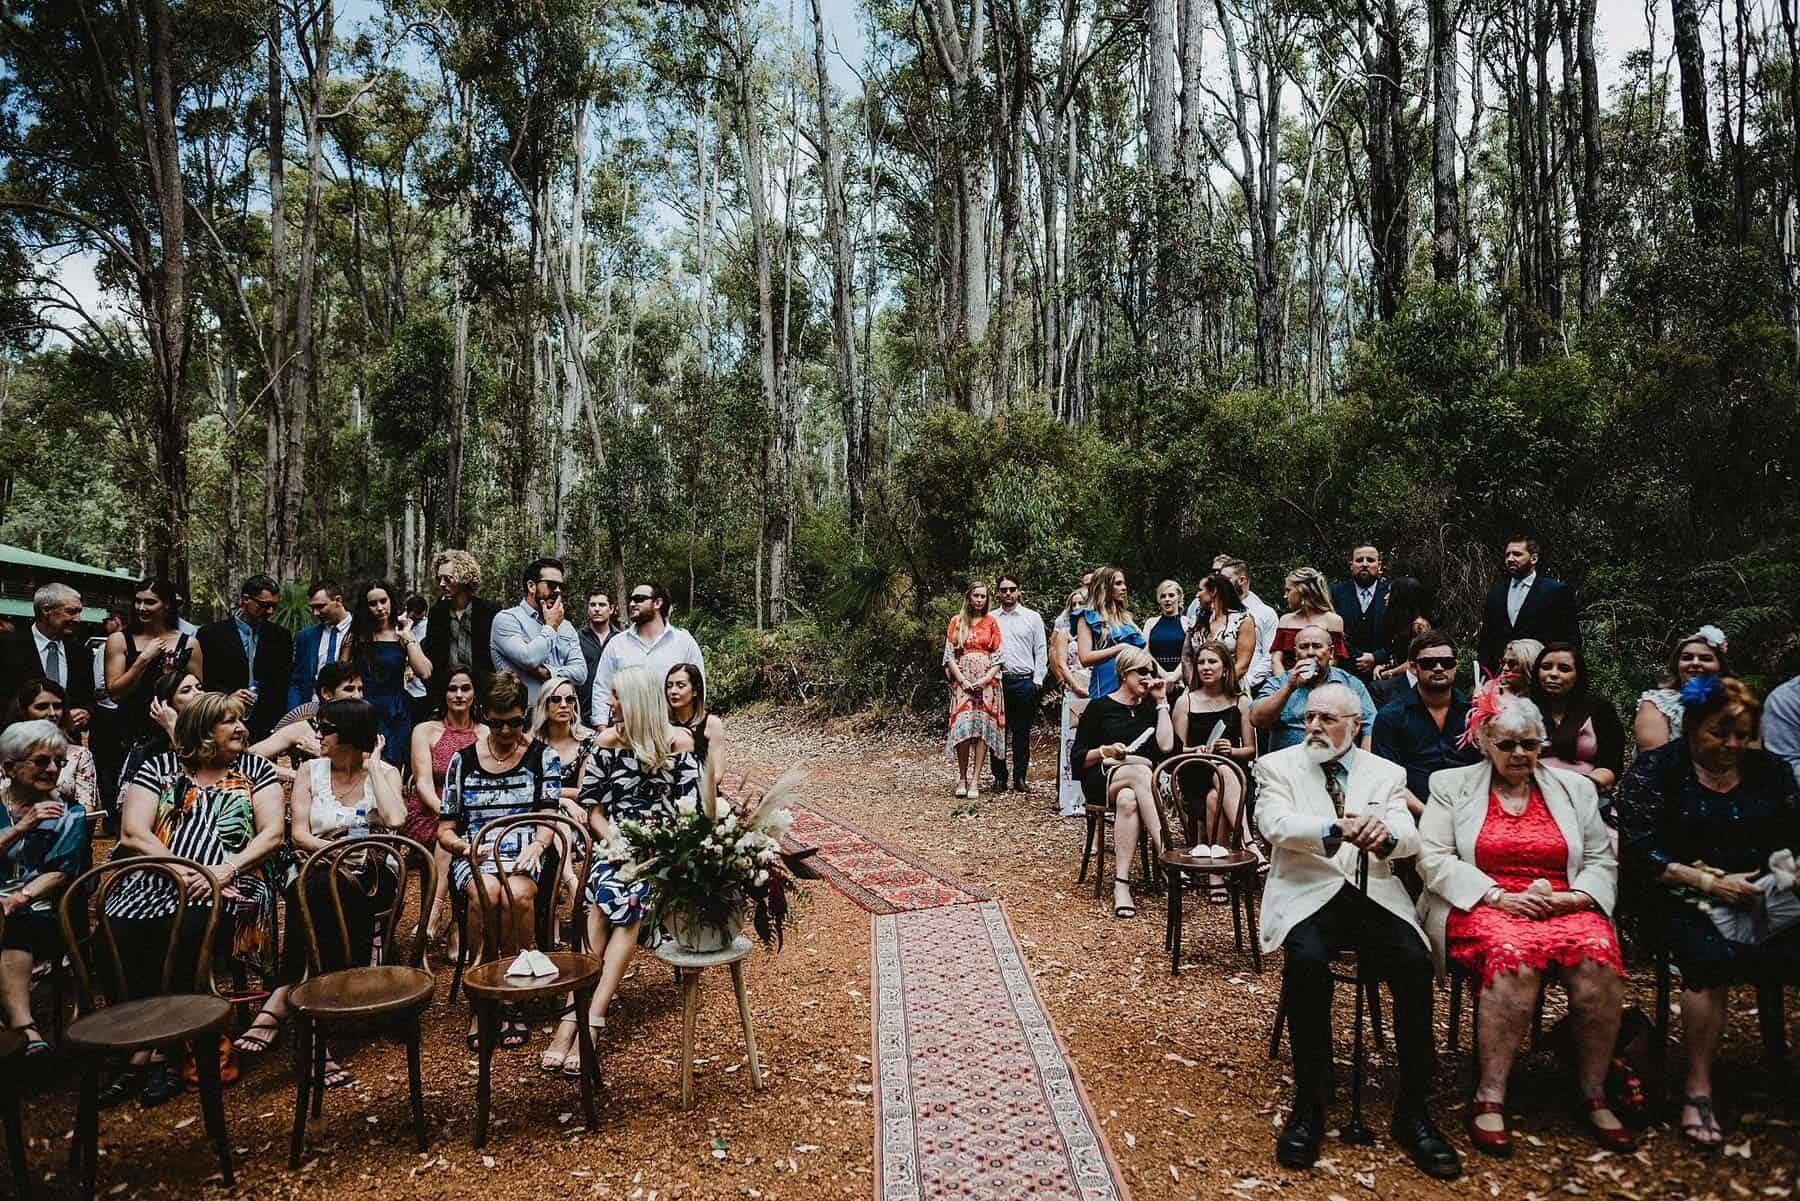 South west forest wedding at Nanga Bush Camp / CJ Williams Photography